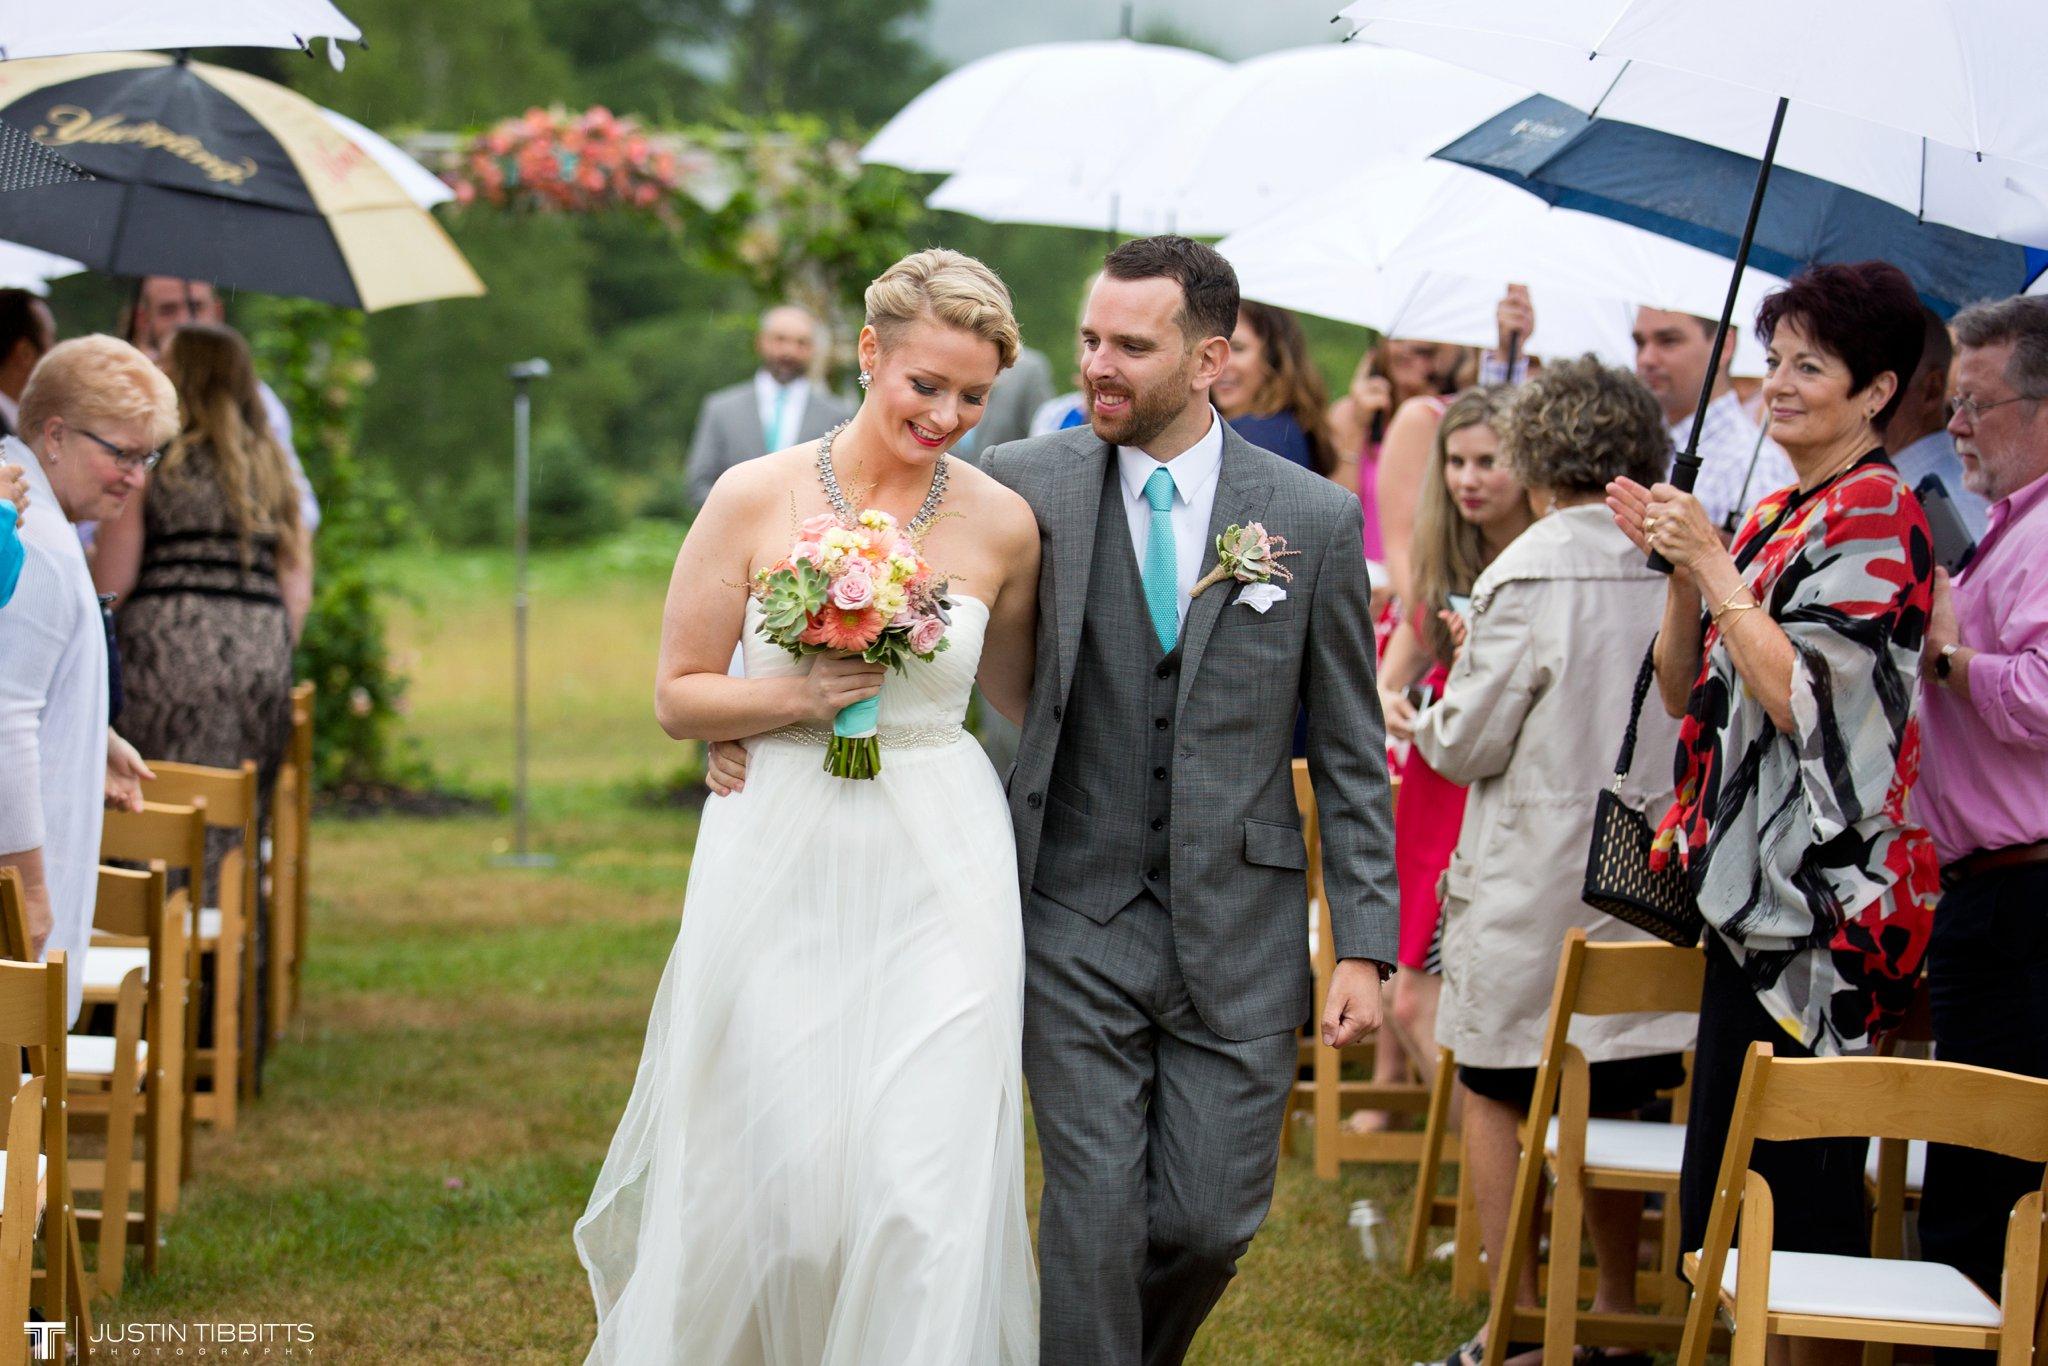 burlap-and-beams-wedding-photos-with-joran-and-molly_0075